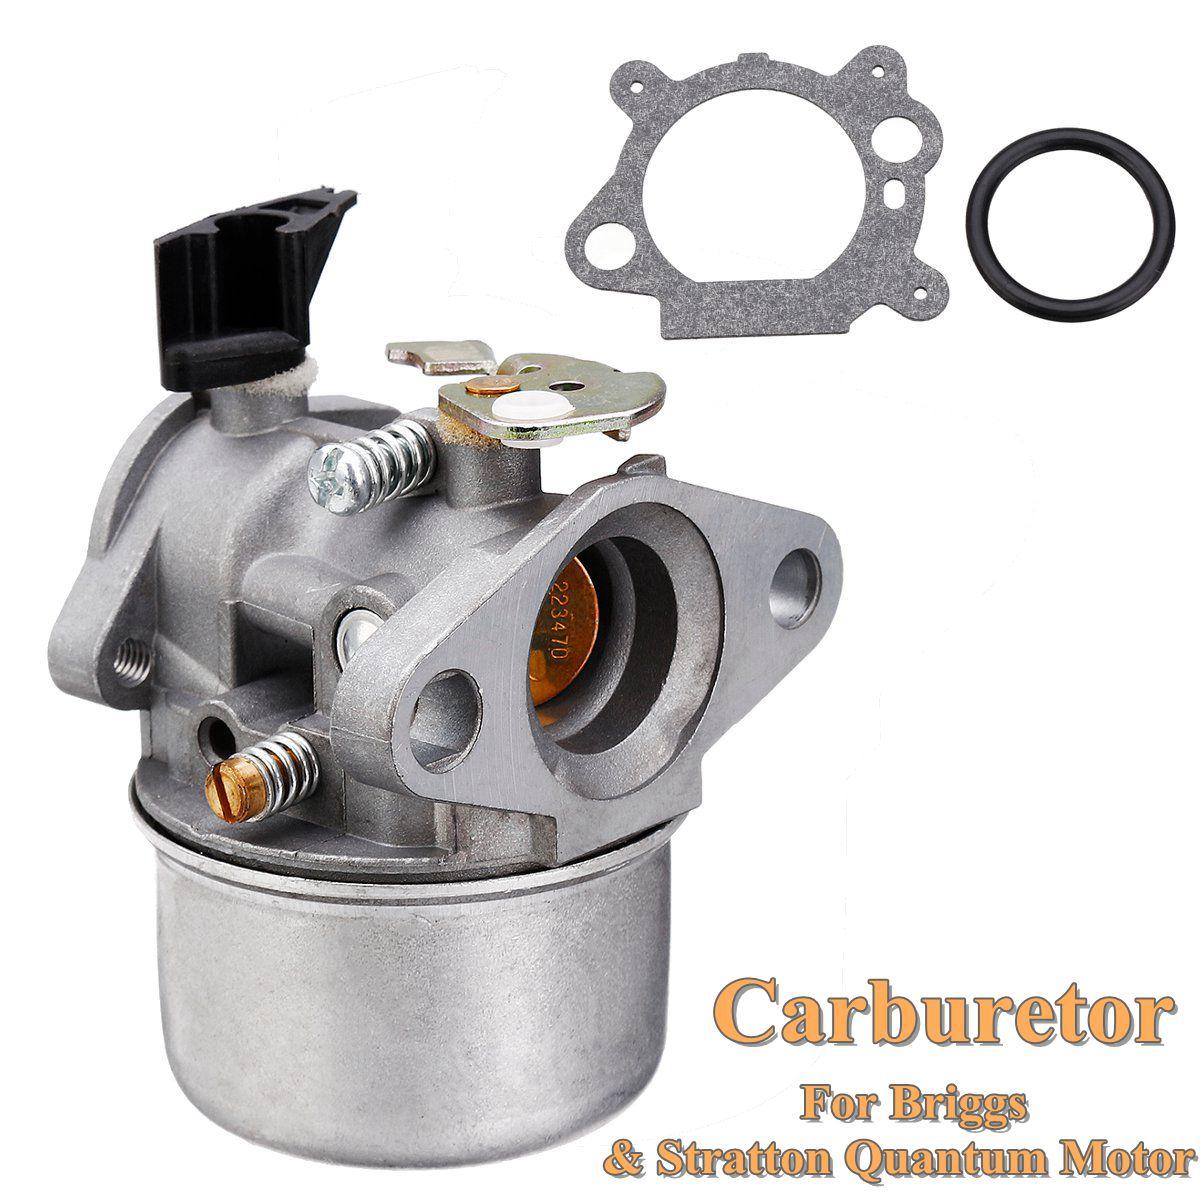 1 Pcs Choke Vergaser Carburateur Carburetor Briggs Stratton Quantum Motor 498965 With Gasket And Rubber Ring